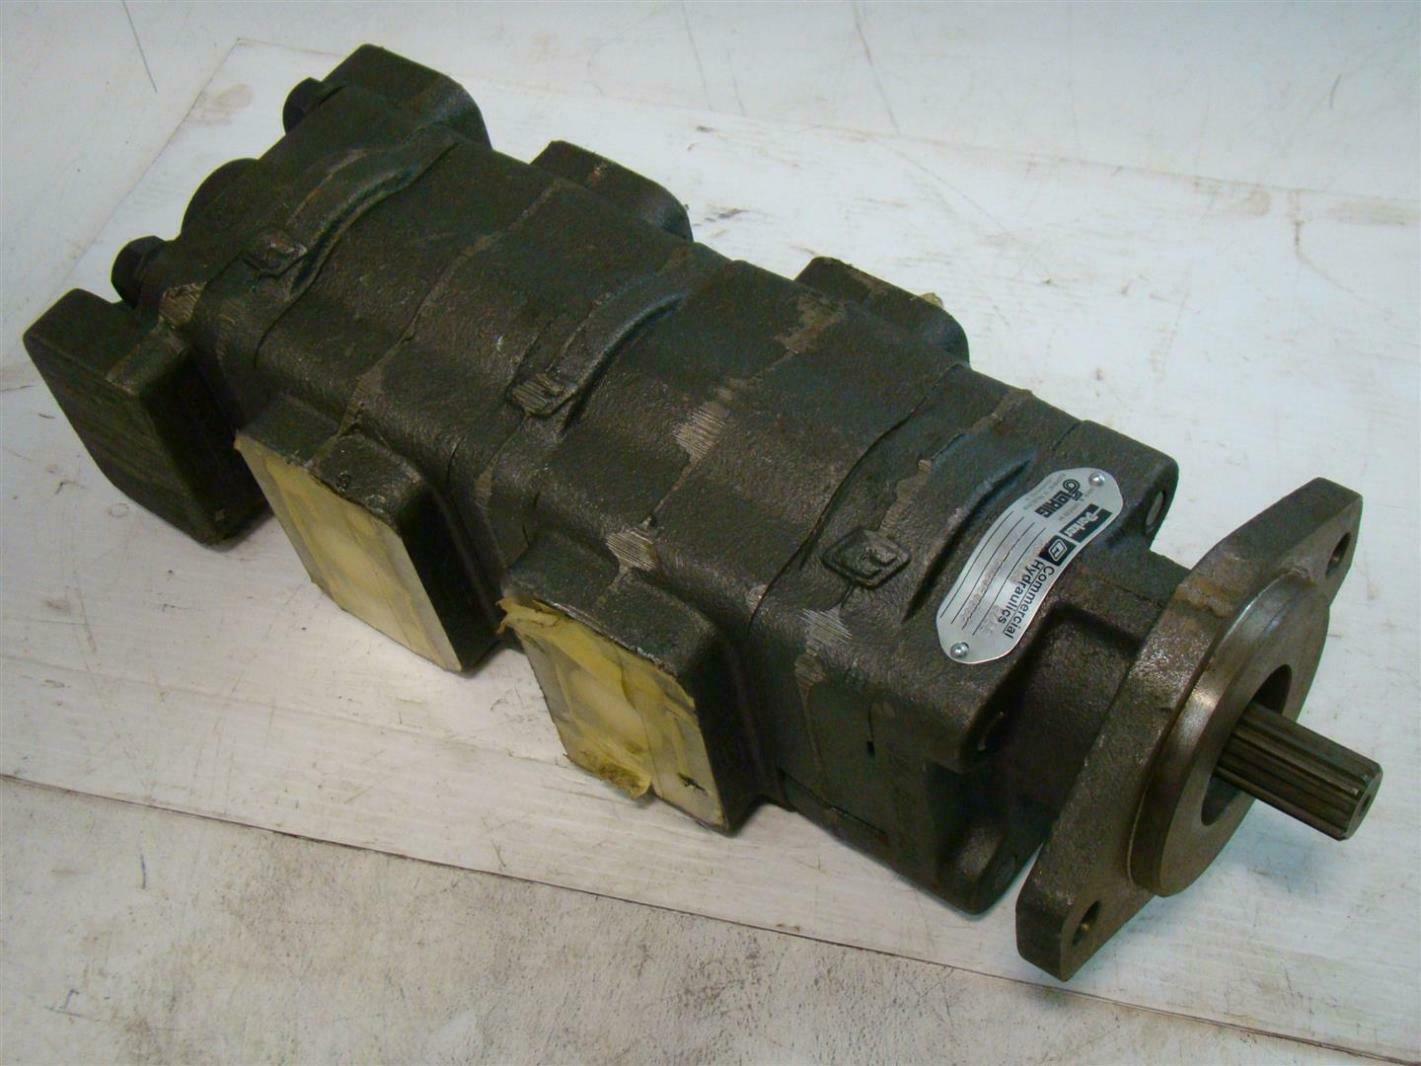 Florig parker commercial hydraulics pump prt 2766 0302 for Parker pumps and motors